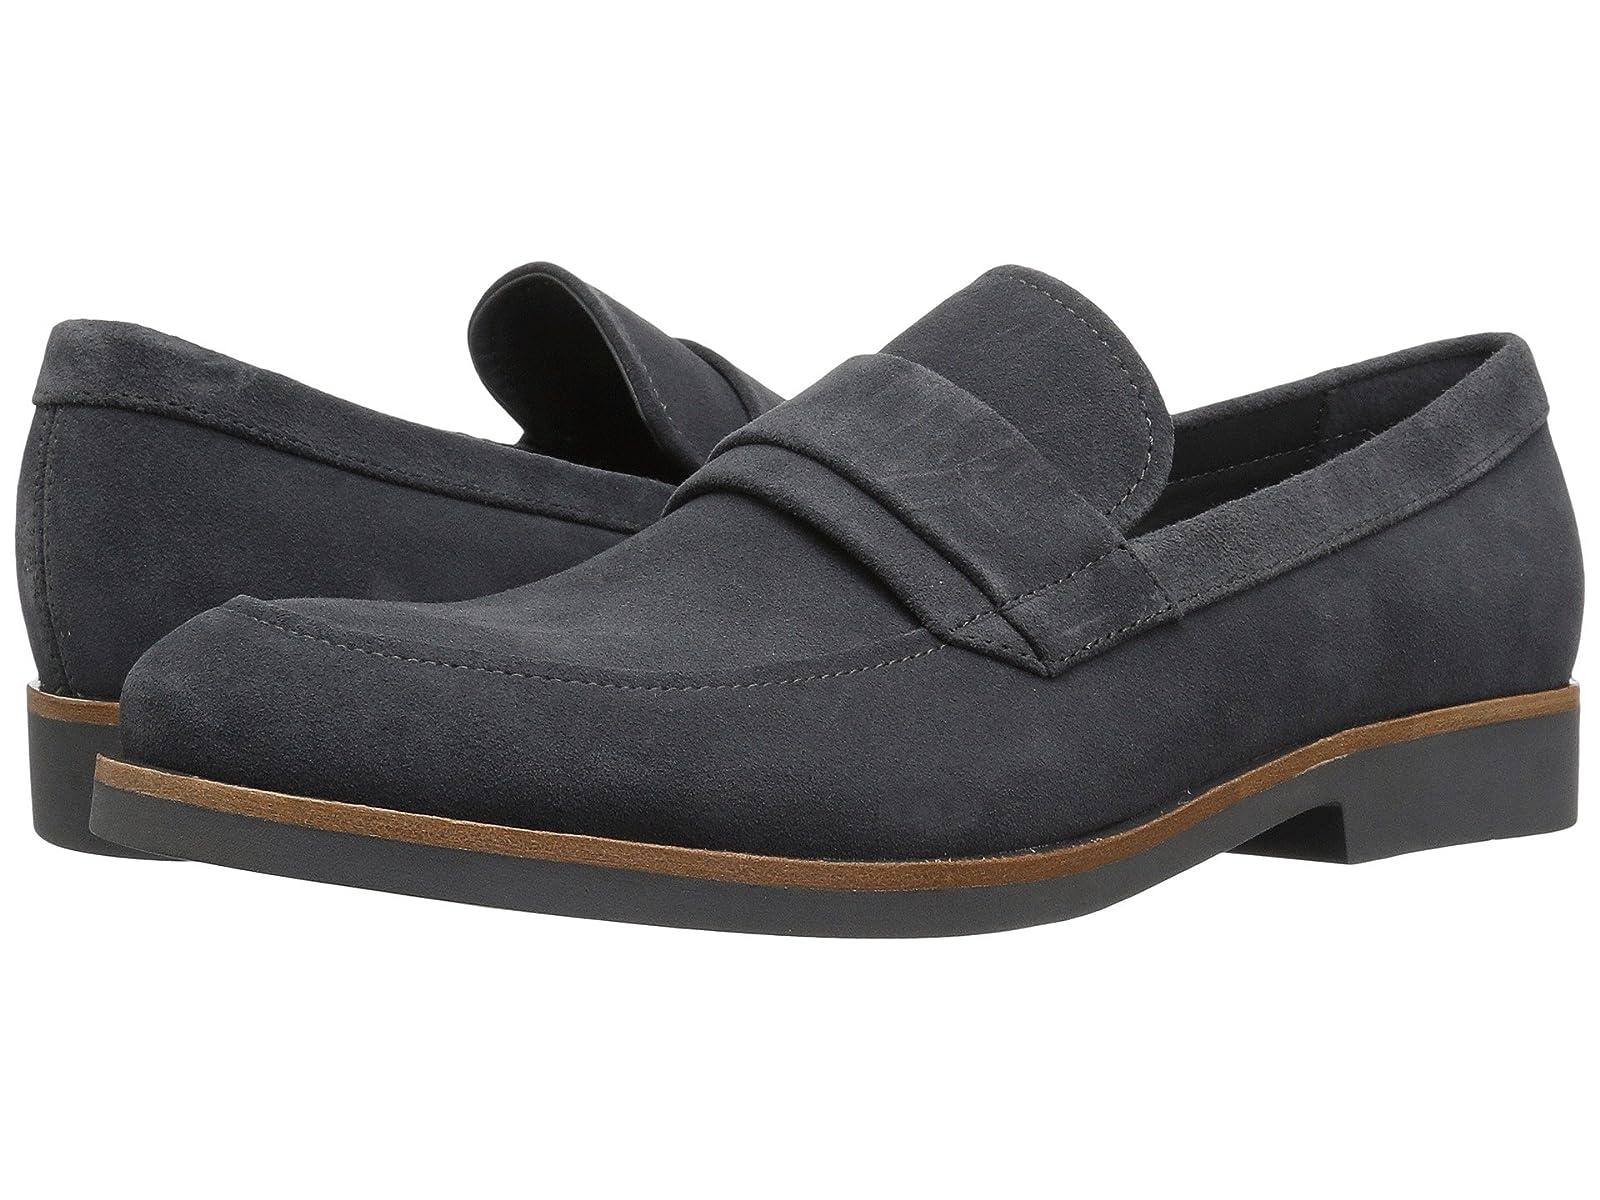 Calvin Klein ForbesCheap and distinctive eye-catching shoes